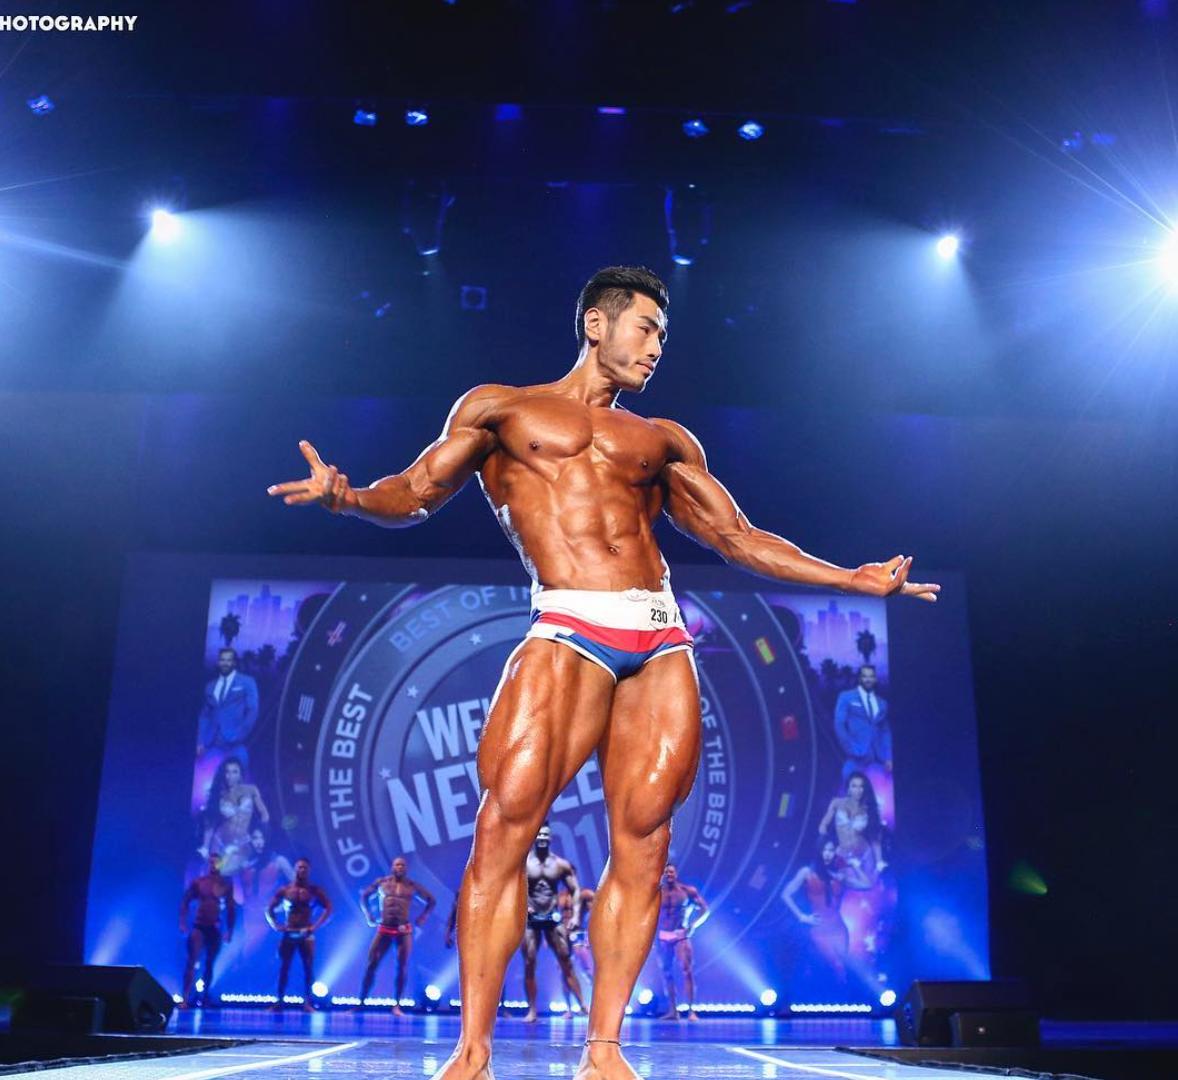 Kyle Kim, WBFF PRO